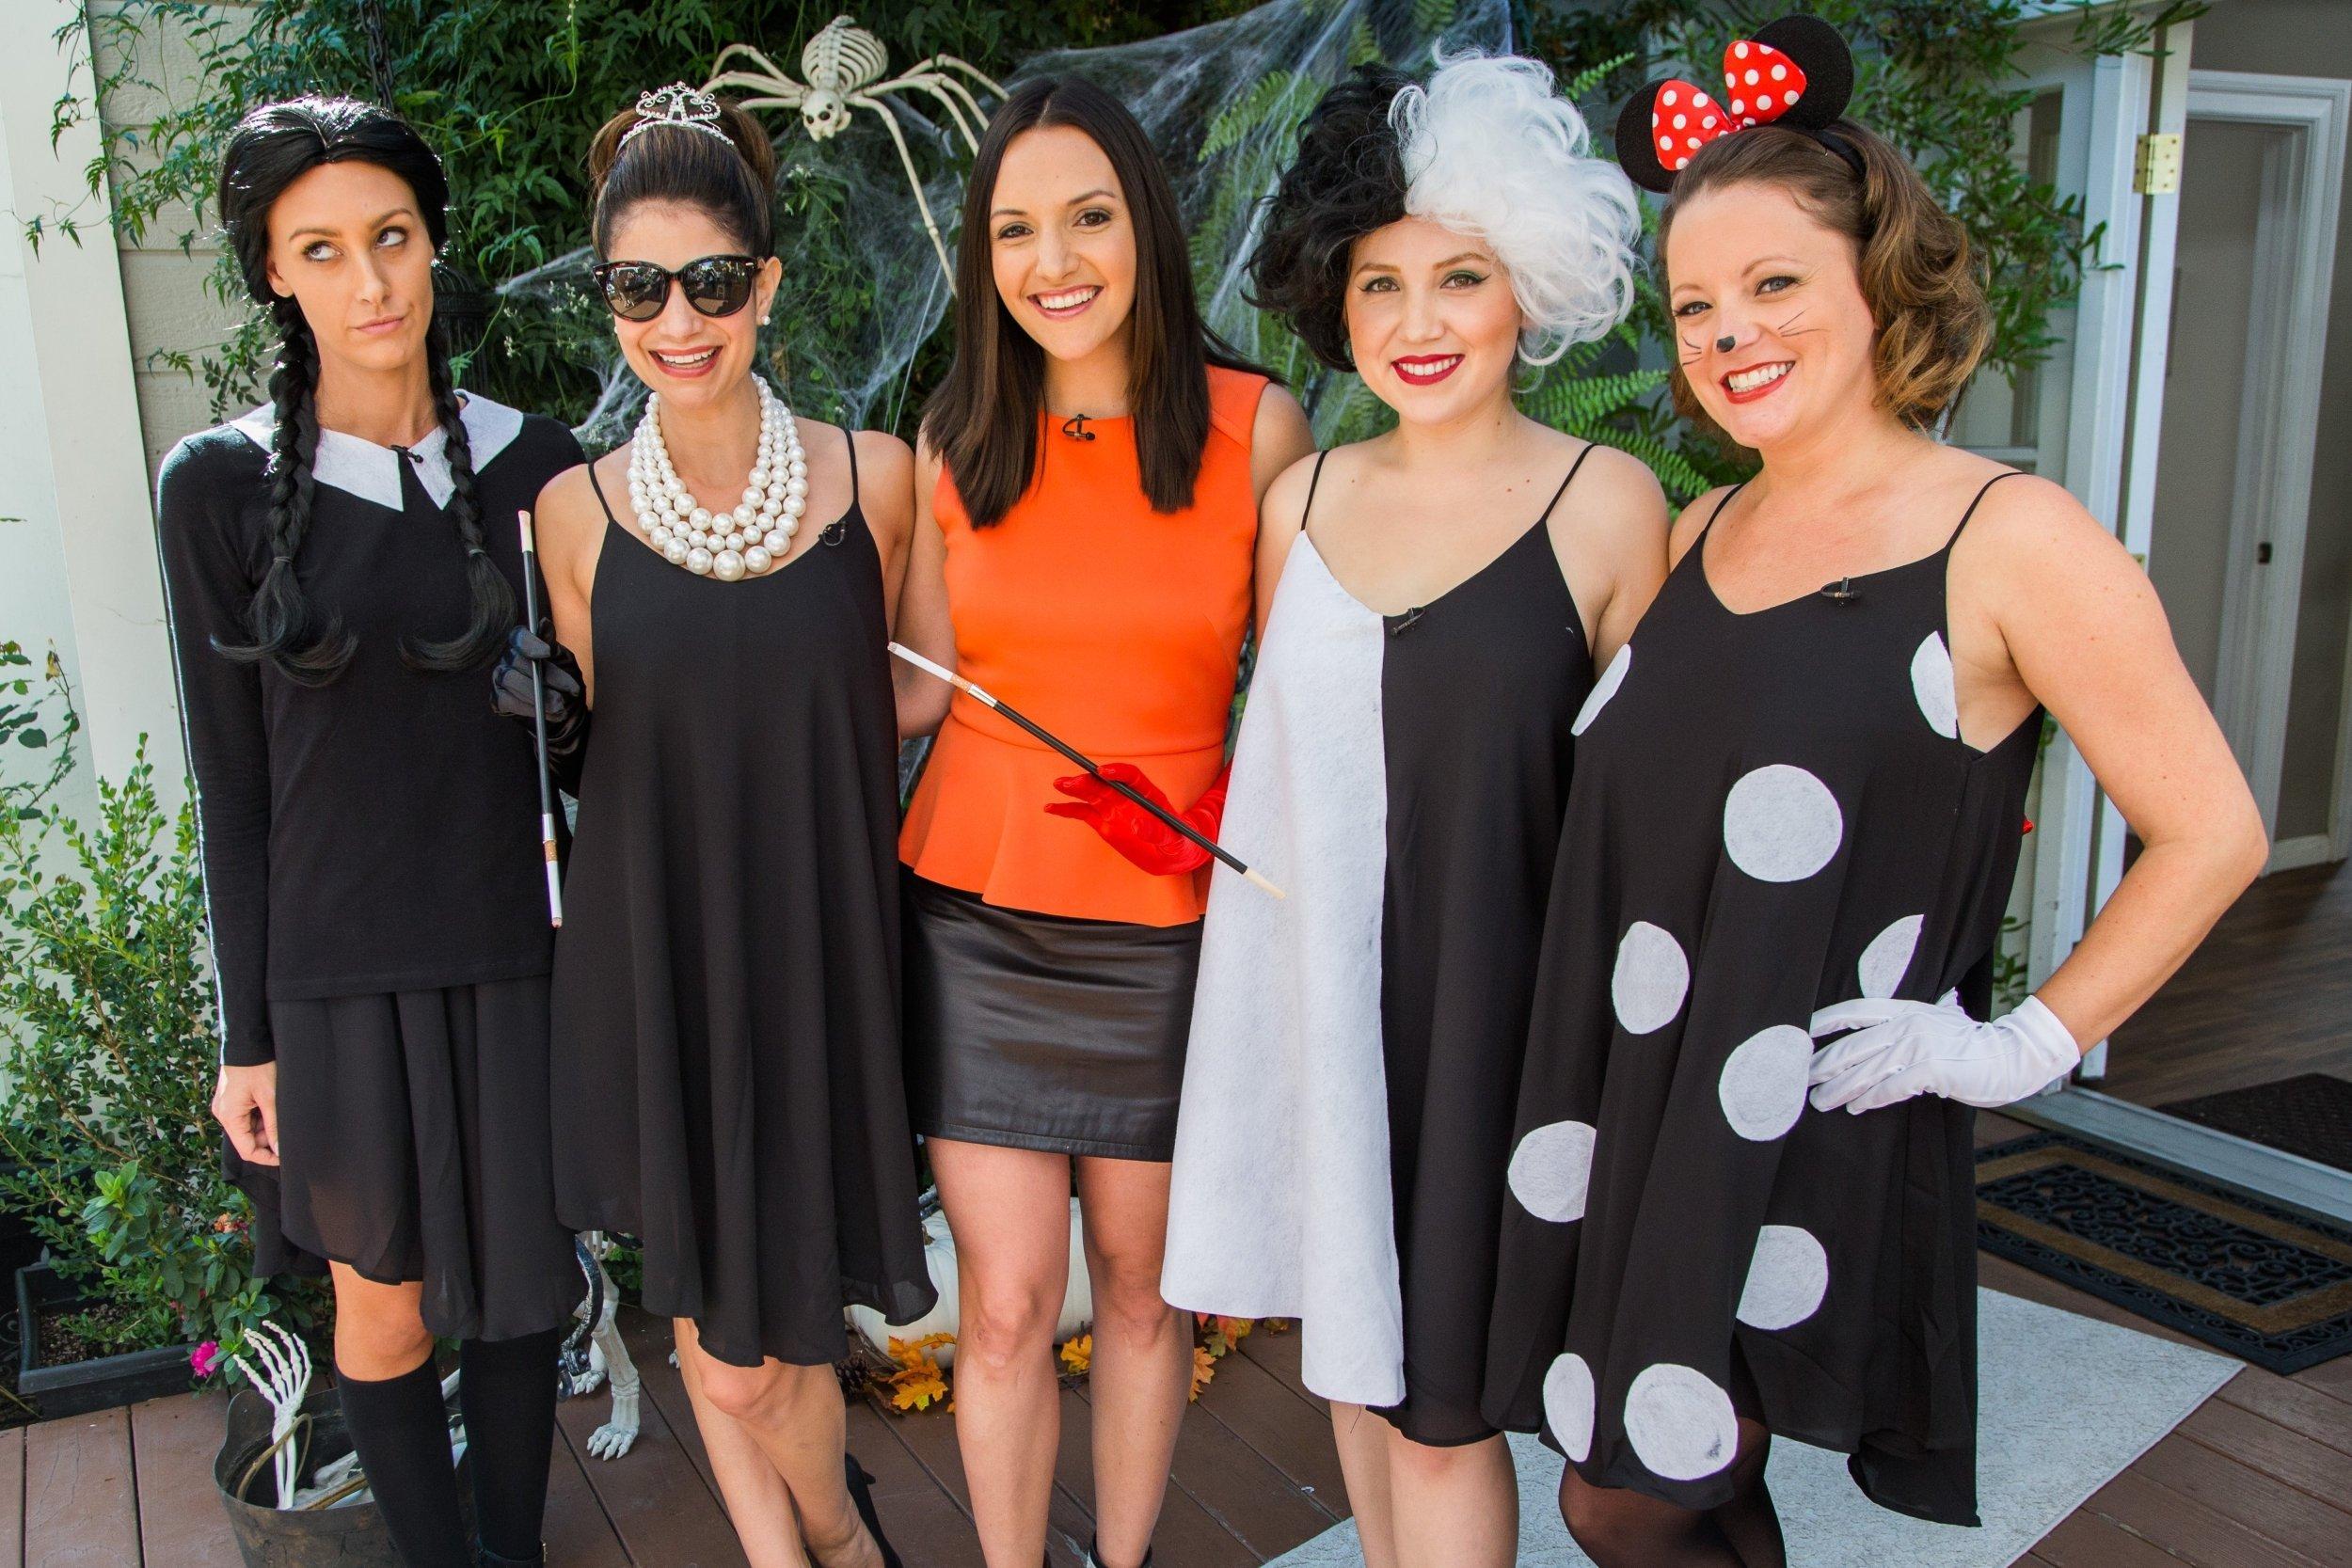 10 Attractive Little Black Dress Costume Ideas four costume ideas with one little black dress home family 2020